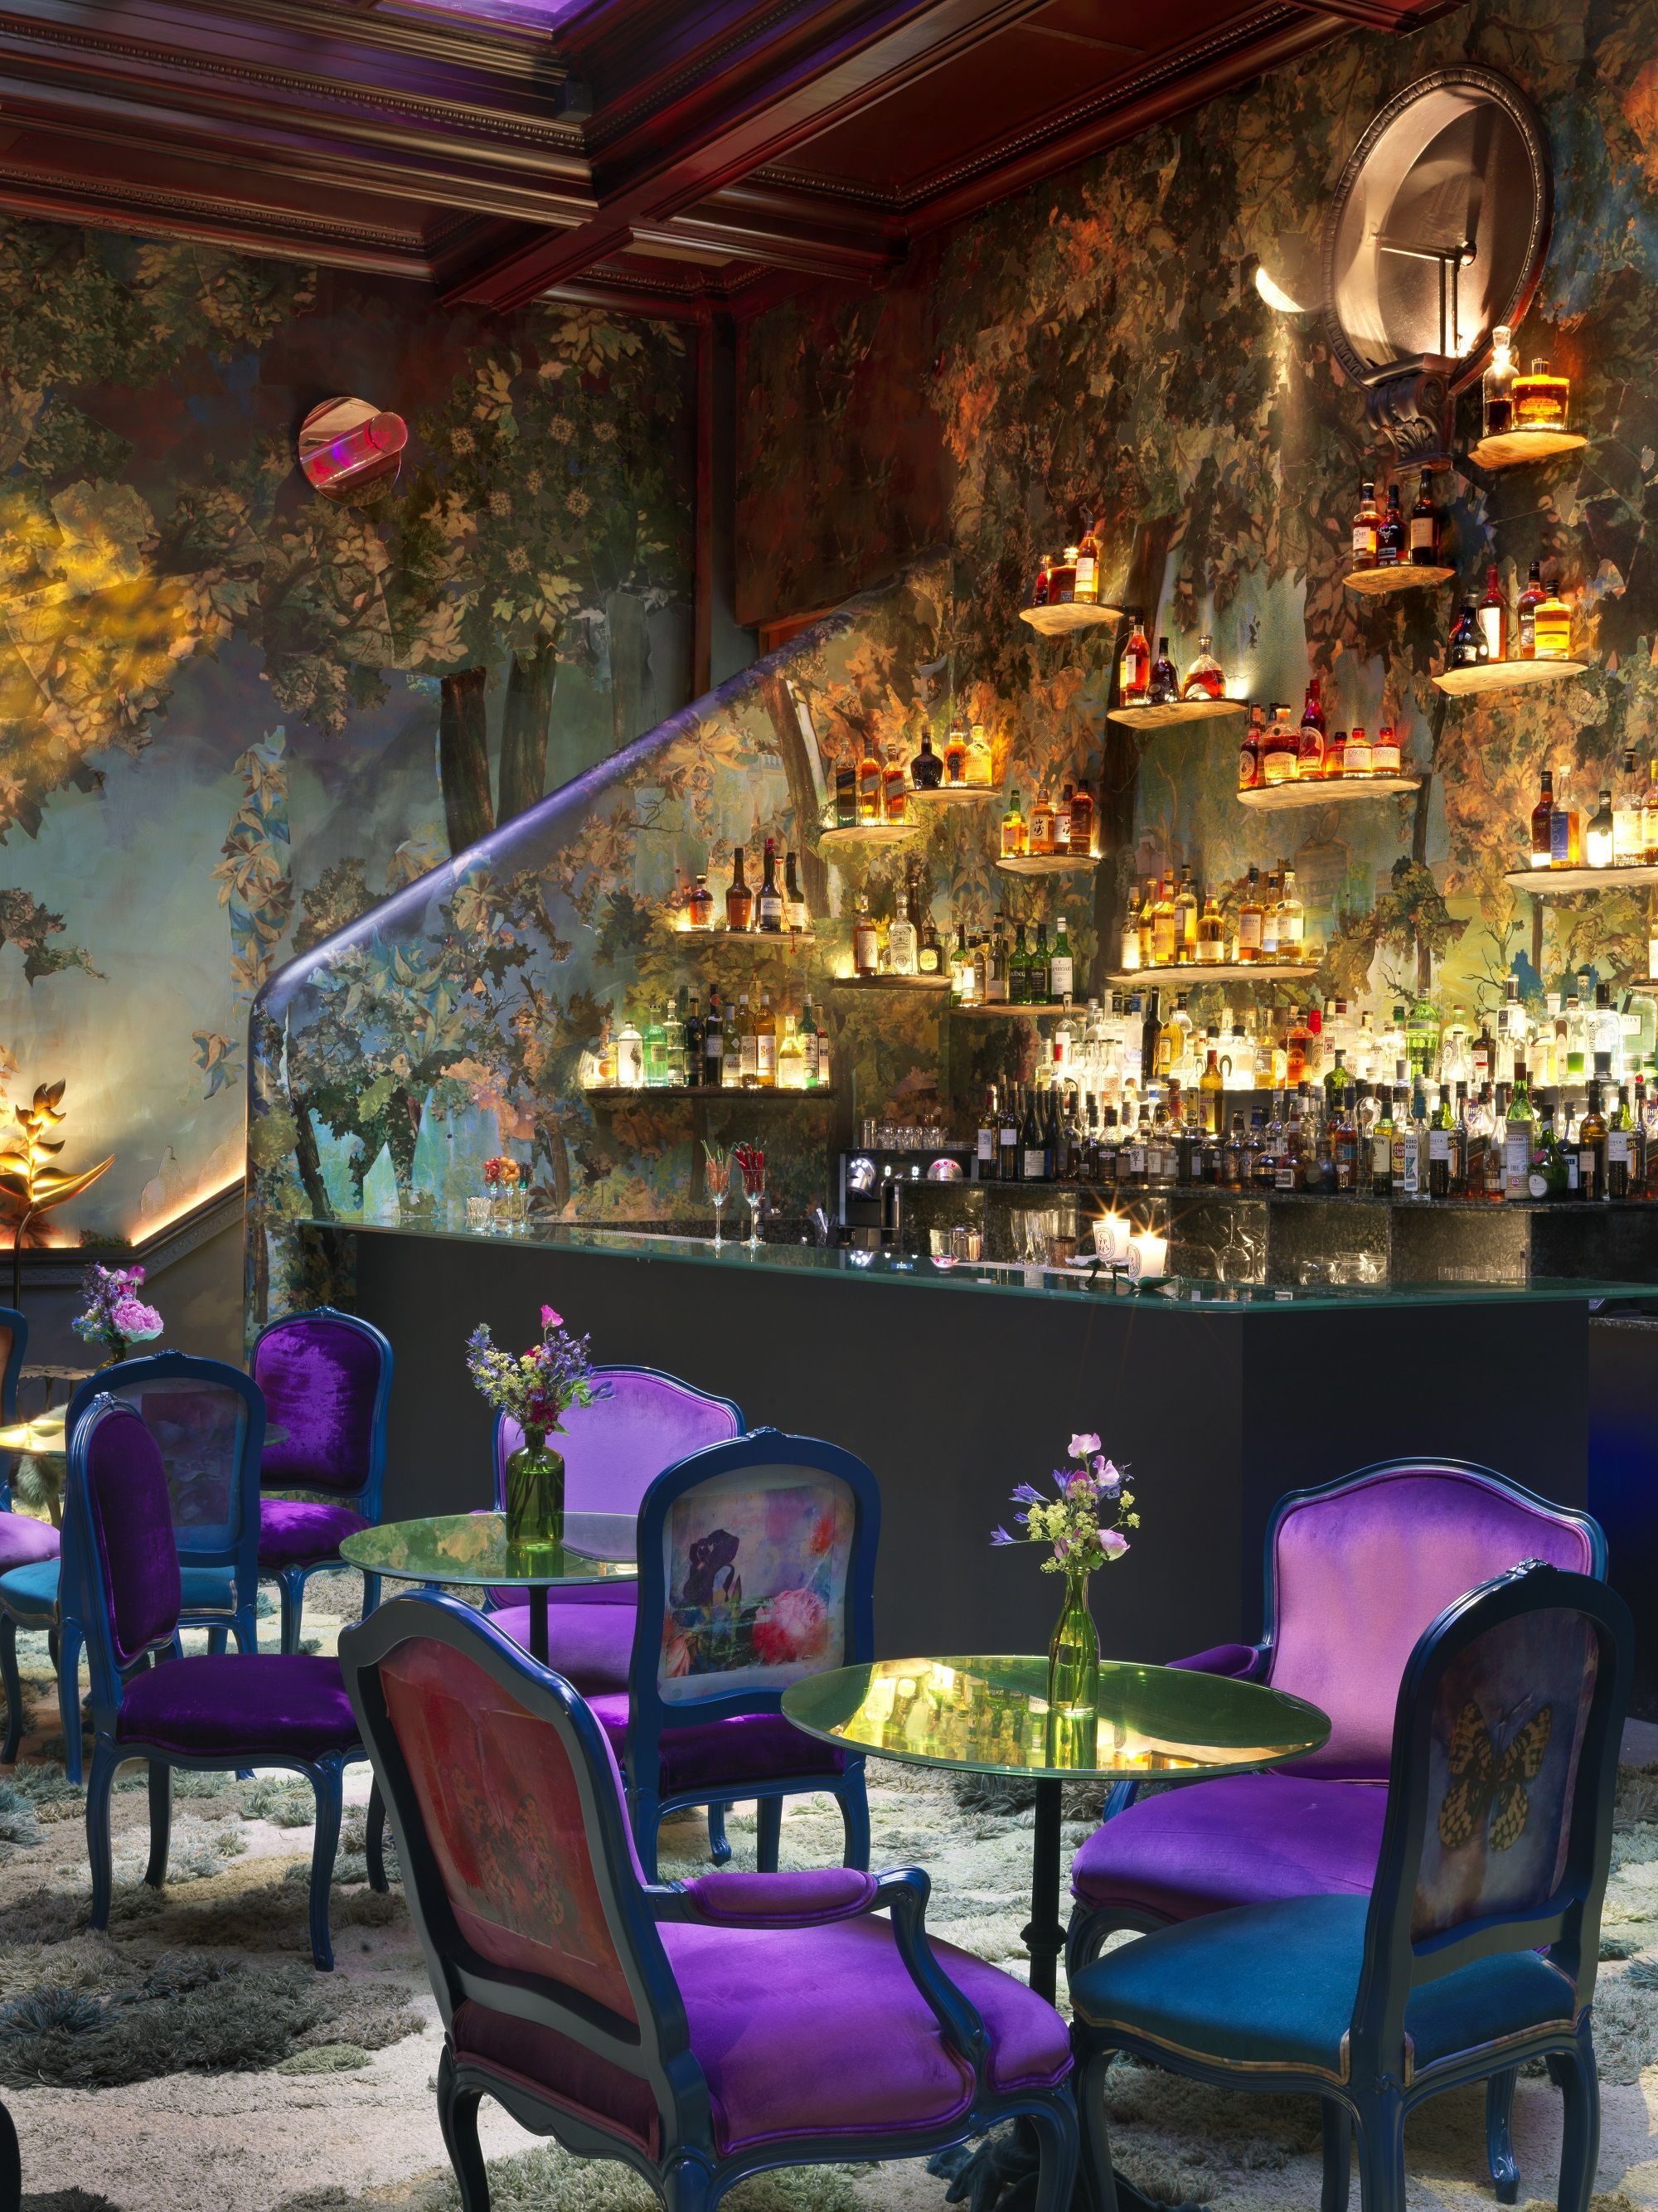 Glade room at Sketch London | The British & Irish Isles | Pinterest ...